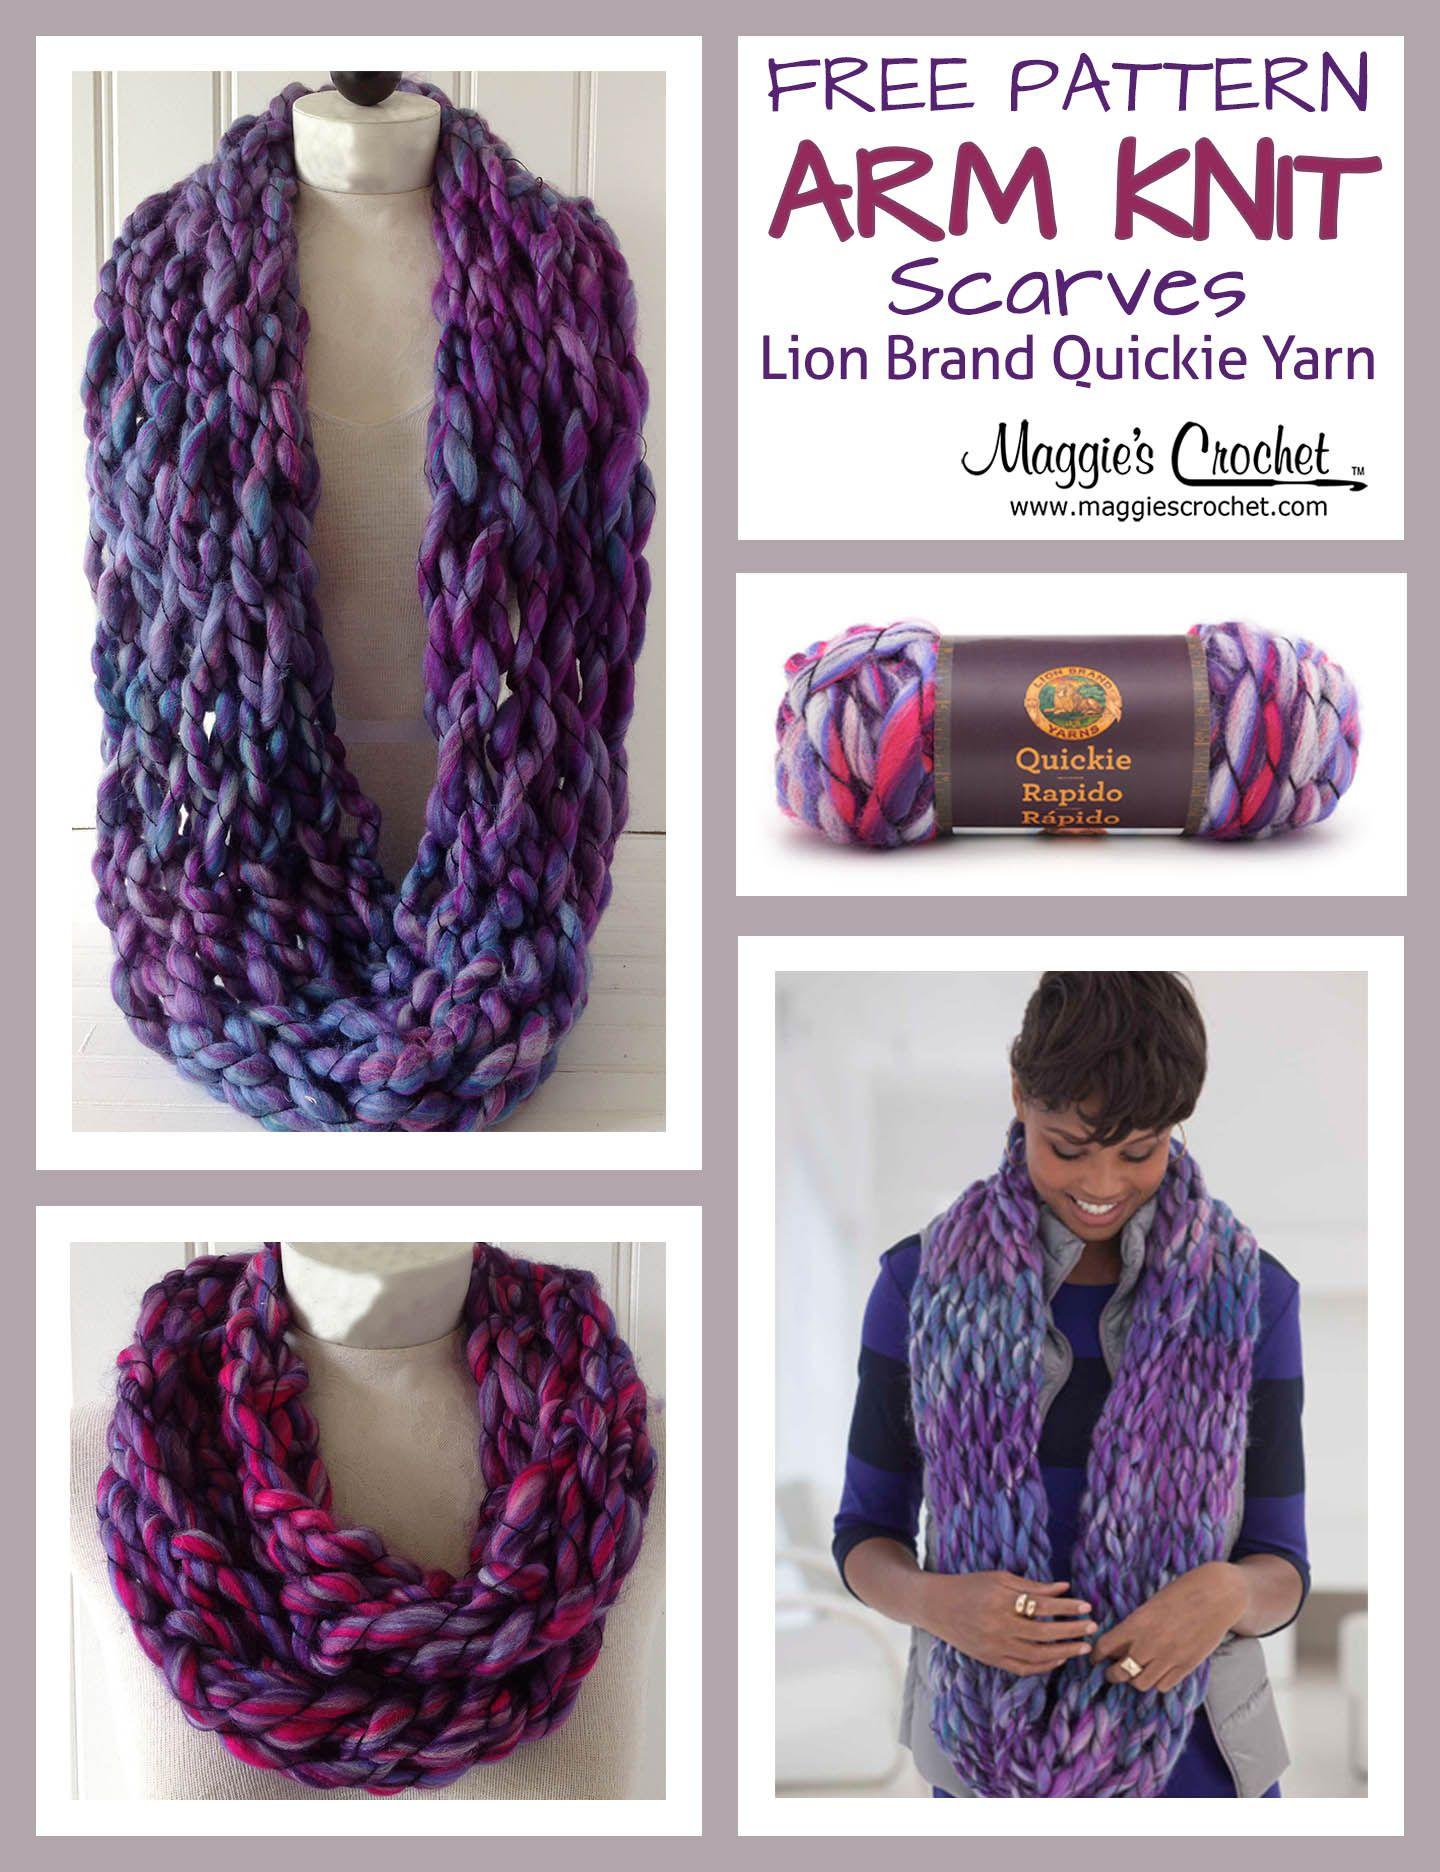 Oversized Merino Wool Scarf - Spring scarf by VIDA VIDA 5wHKw1S7